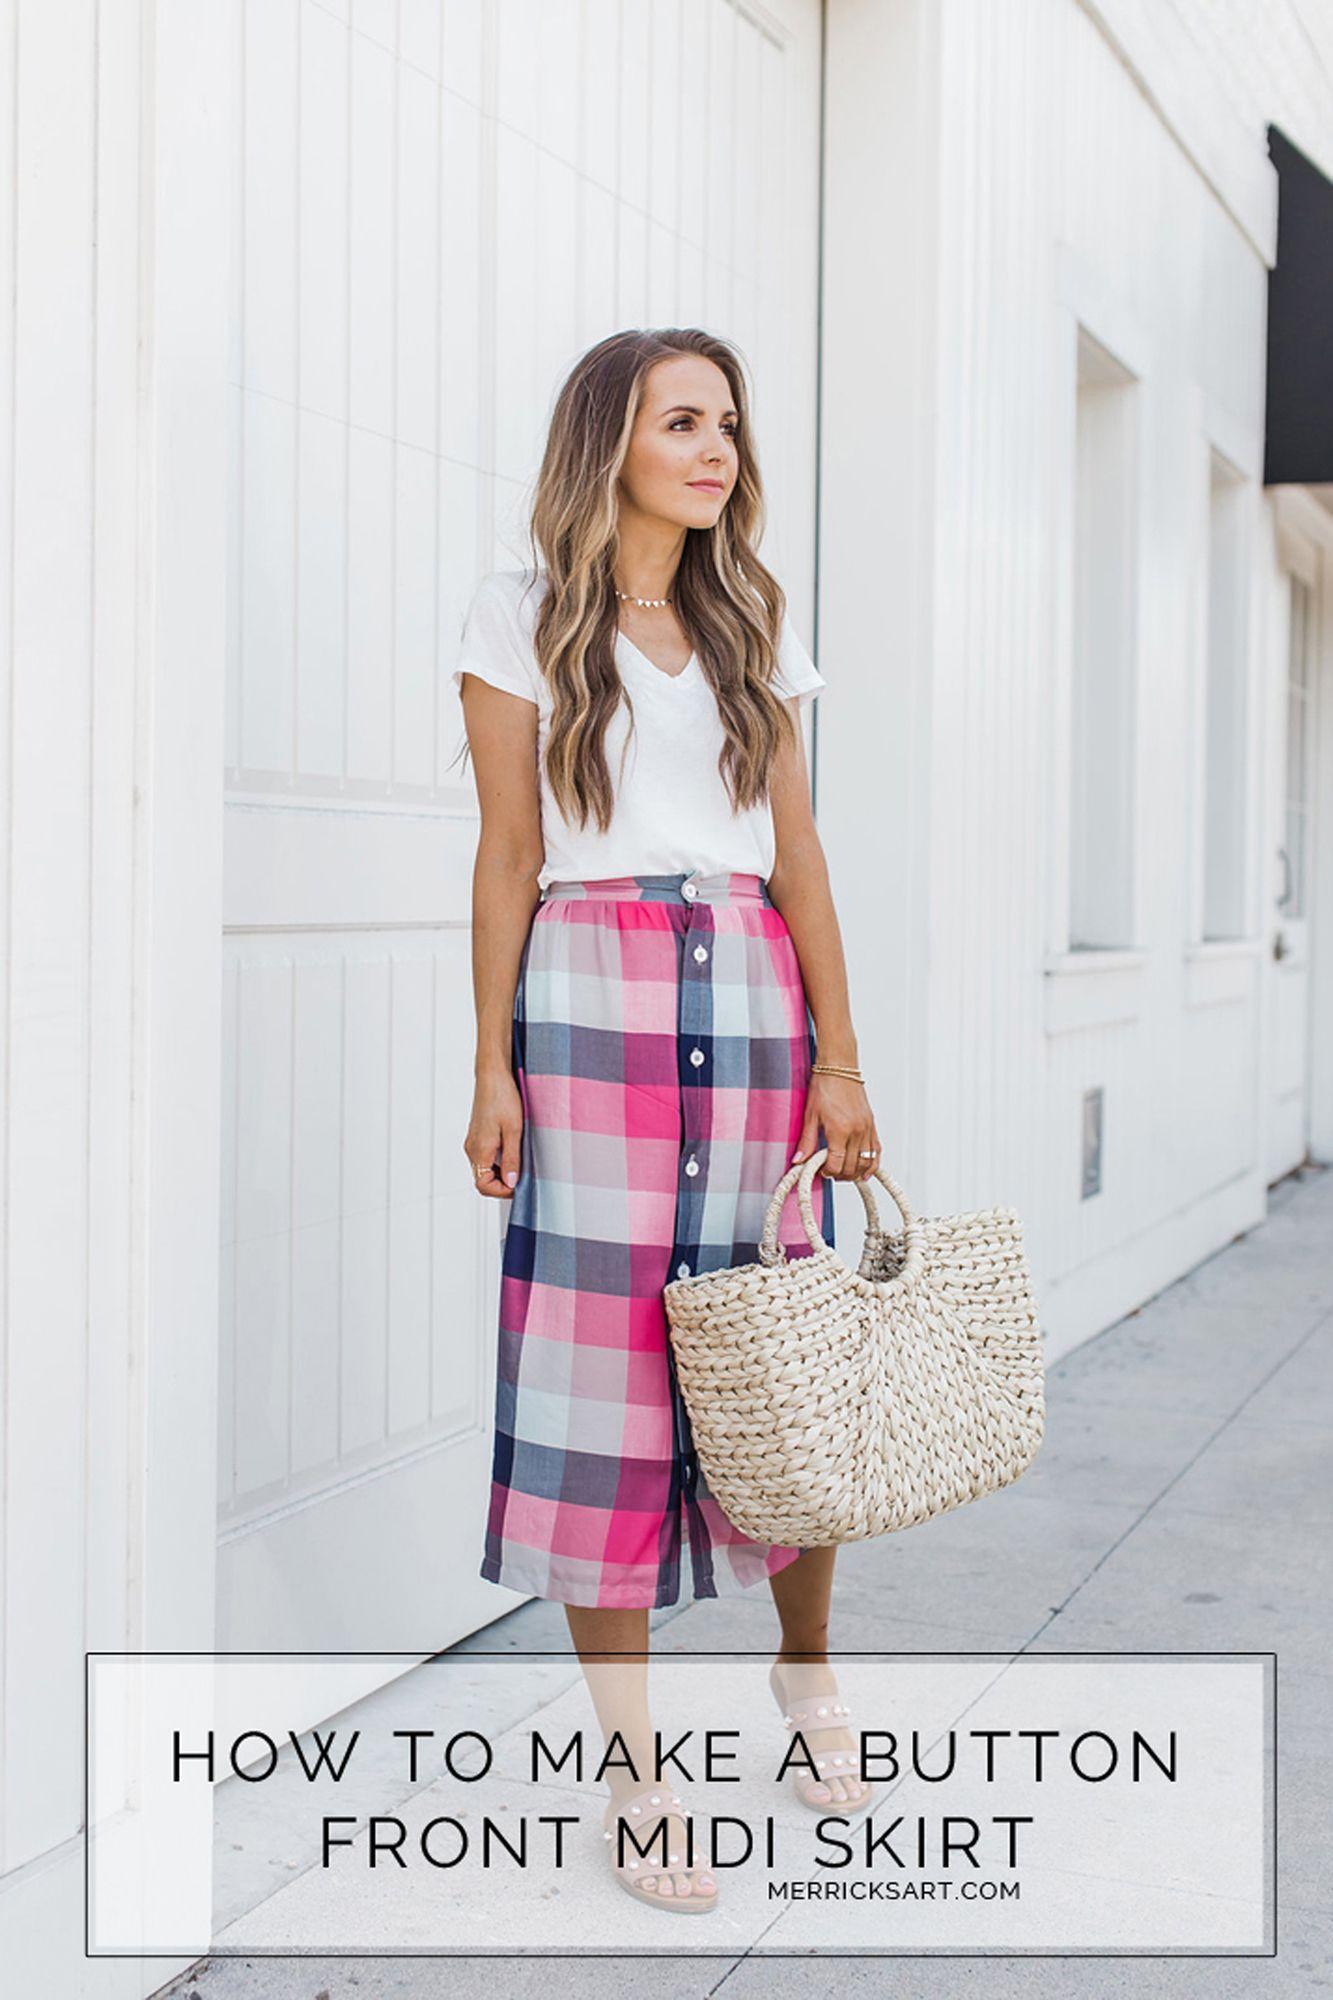 How to Make a Button Front Midi Skirt   Moda   Pinterest   Falda ...